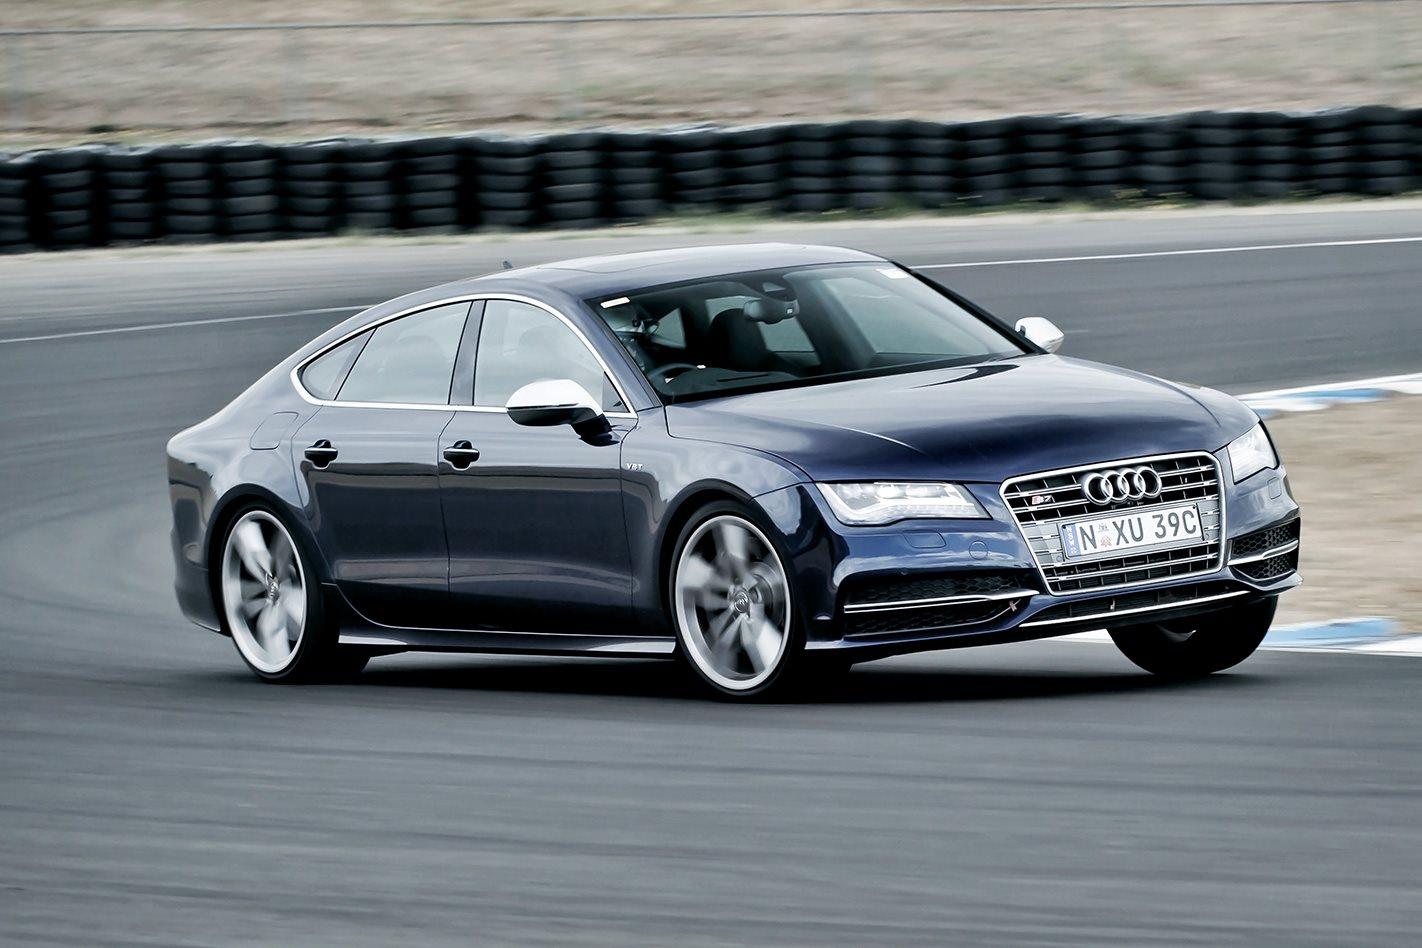 2012-Audi-S7-front.jpg